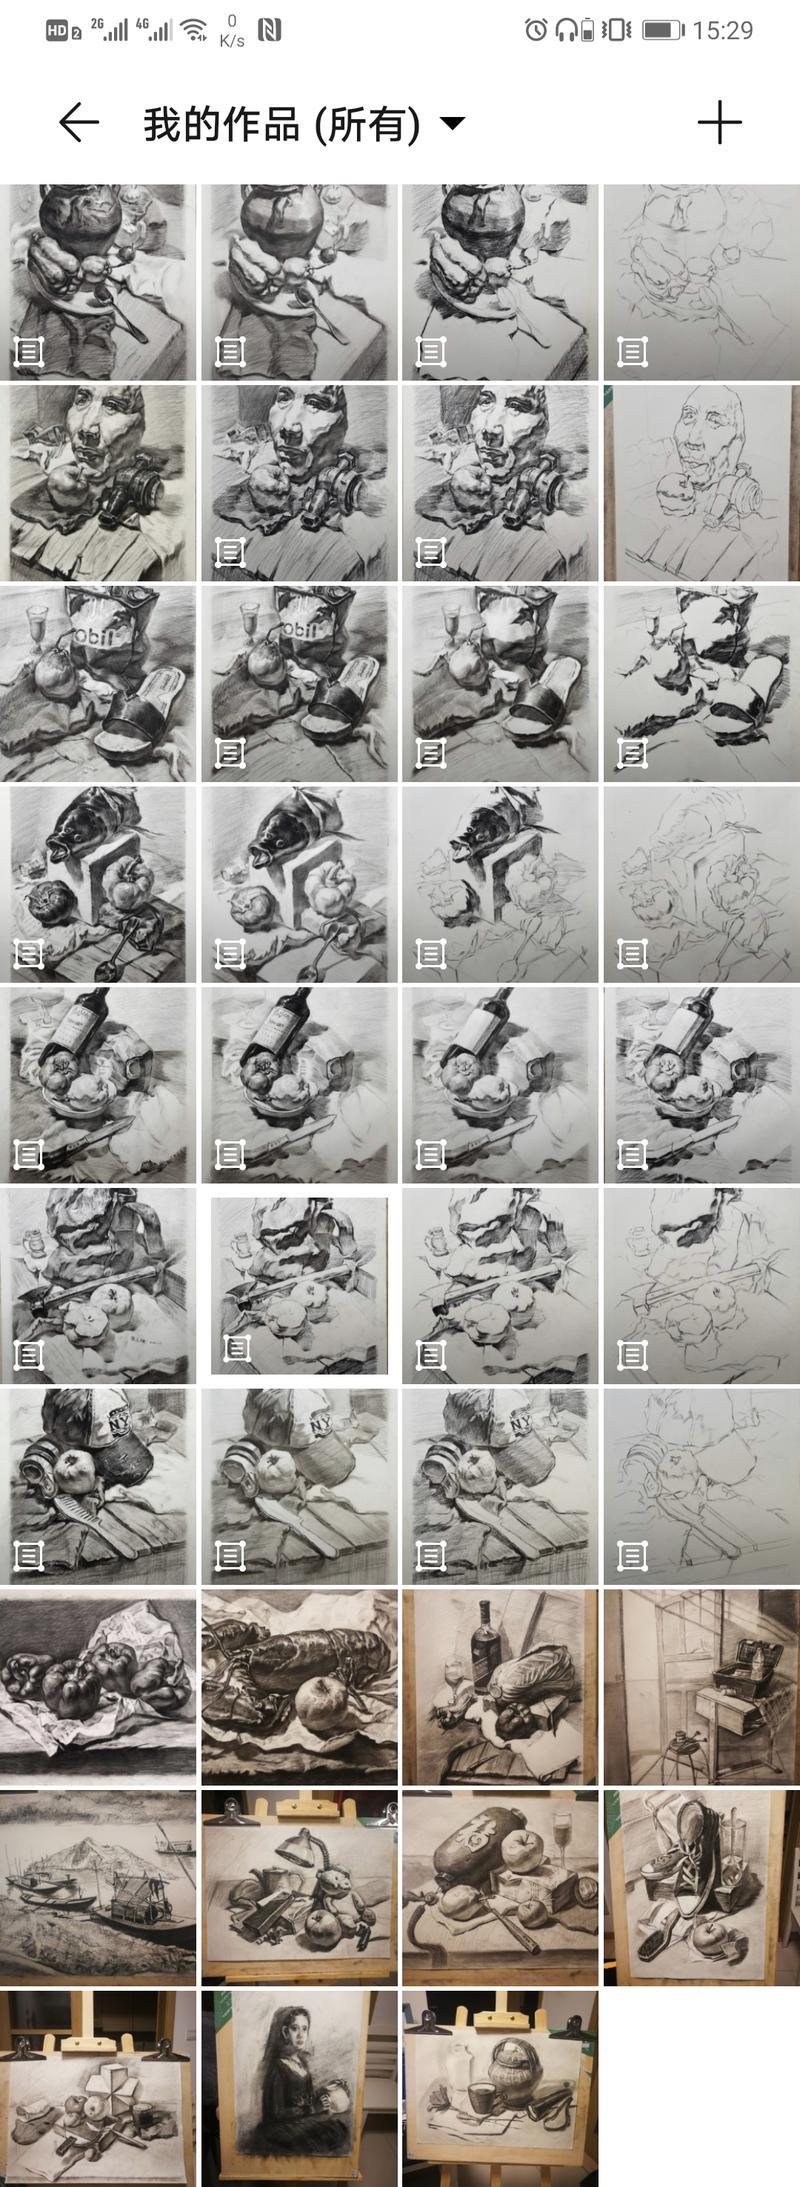 xiaonanguitar于2020-12-04 20:48发布的图片